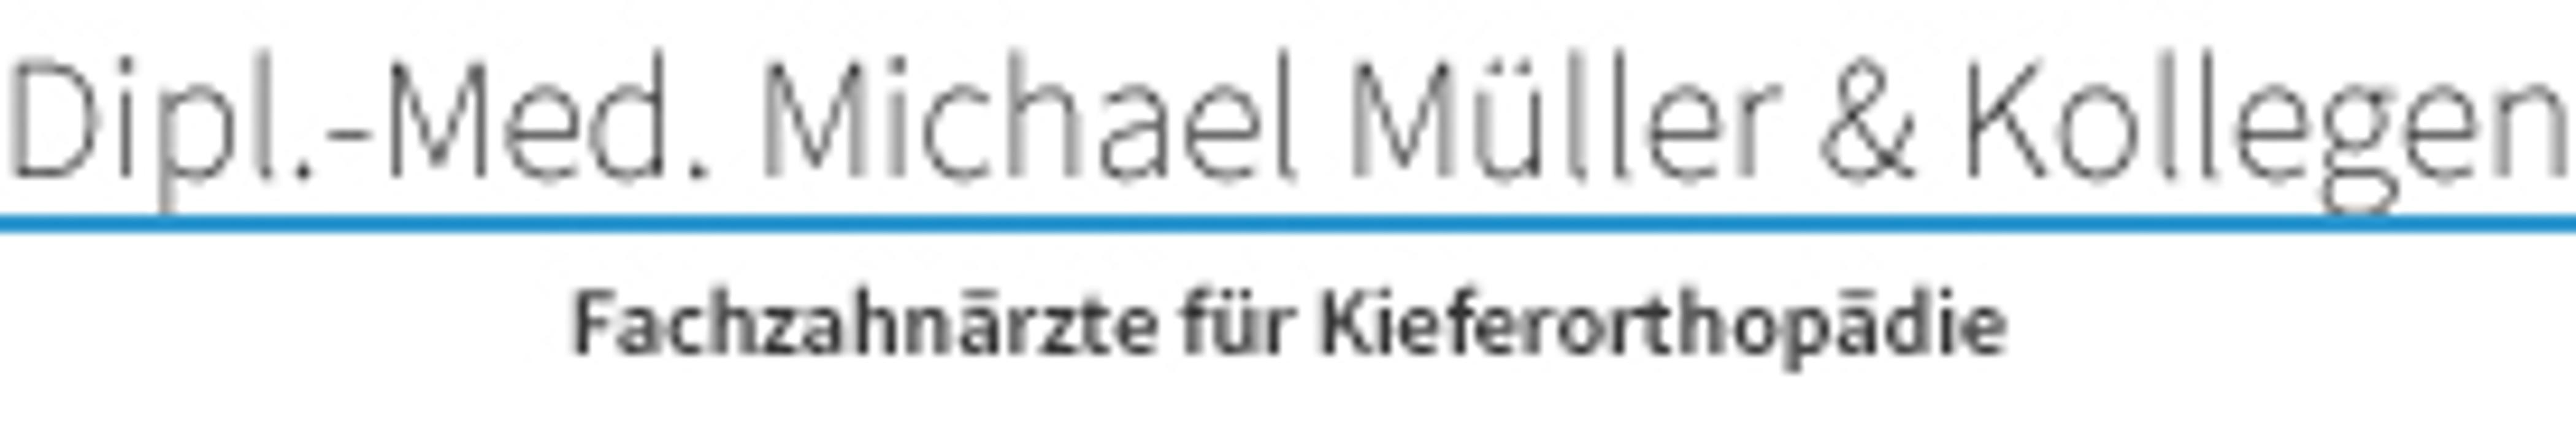 Bild zu Kieferorthopädische Fachpraxis Dipl.-Med. Michael Müller & Kollegen in Berlin